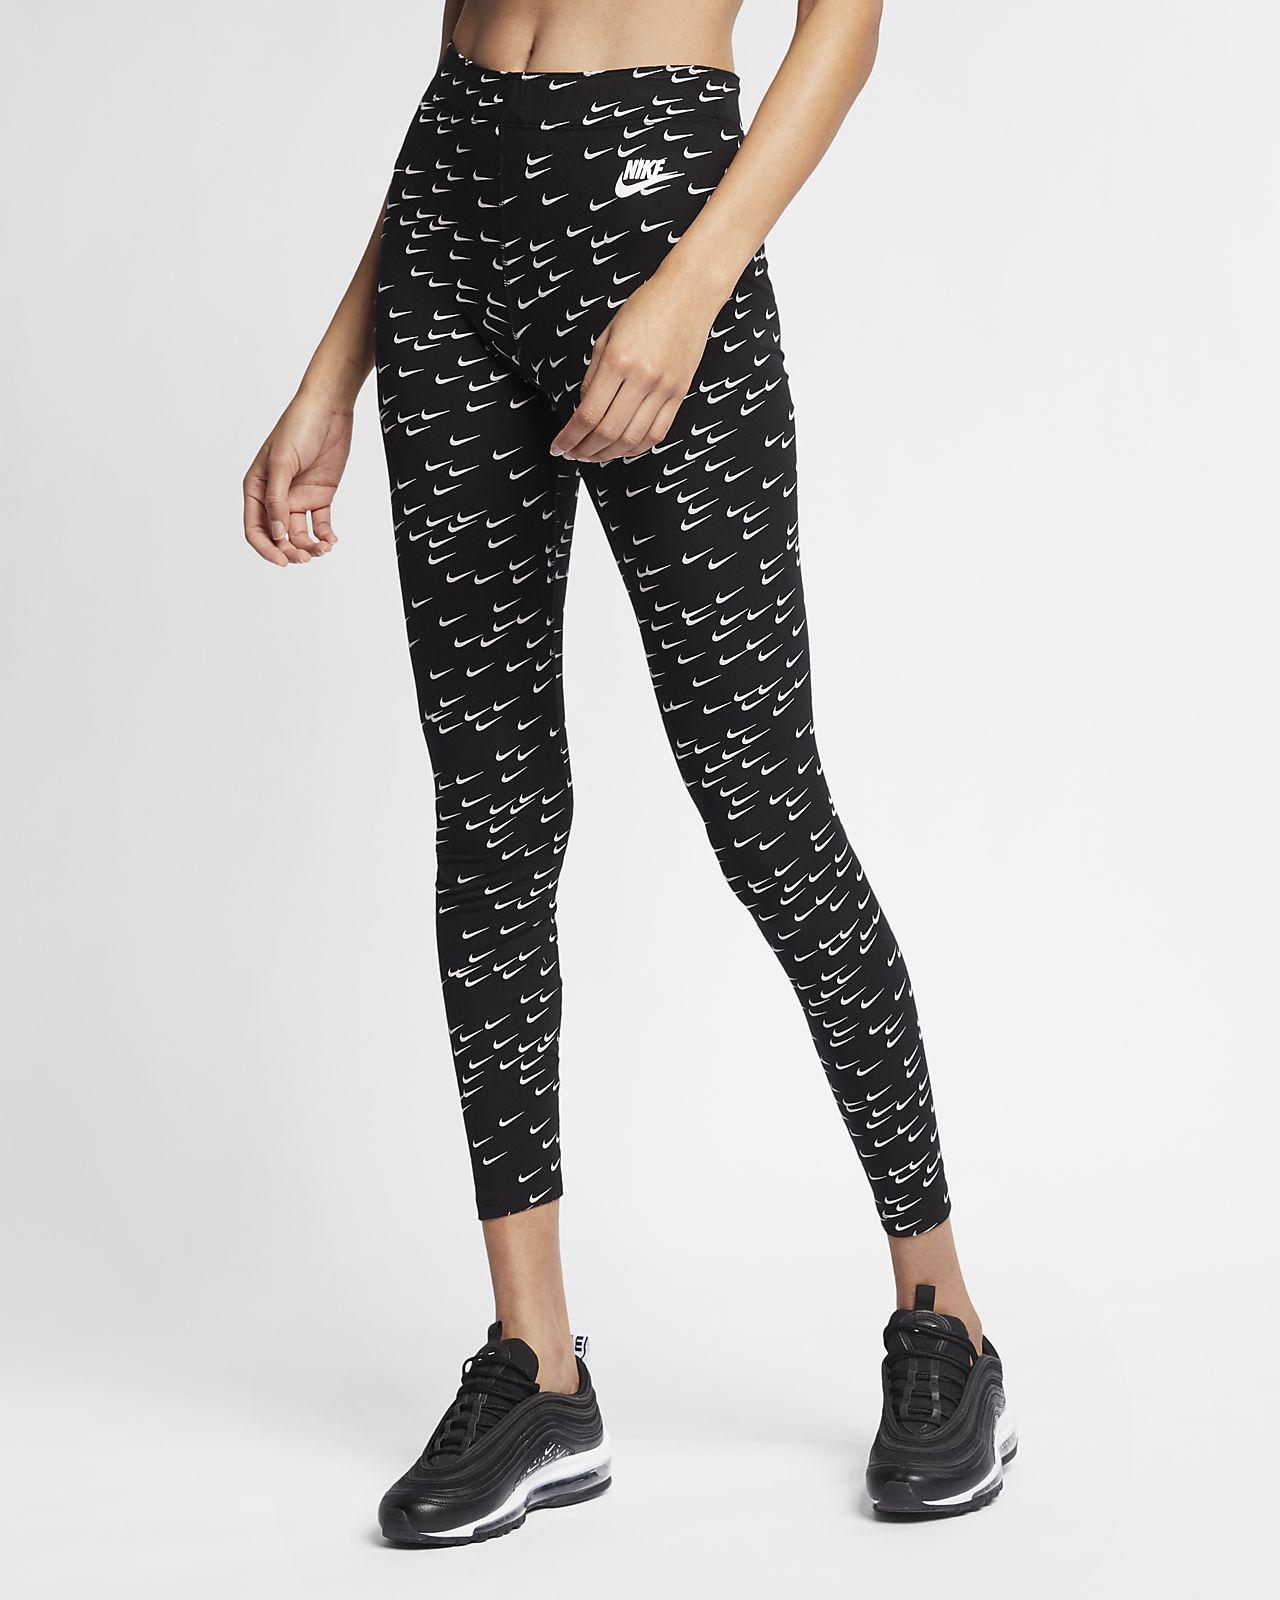 Женские леггинсы с принтом Nike Sportswear Leg-A-See Swoosh